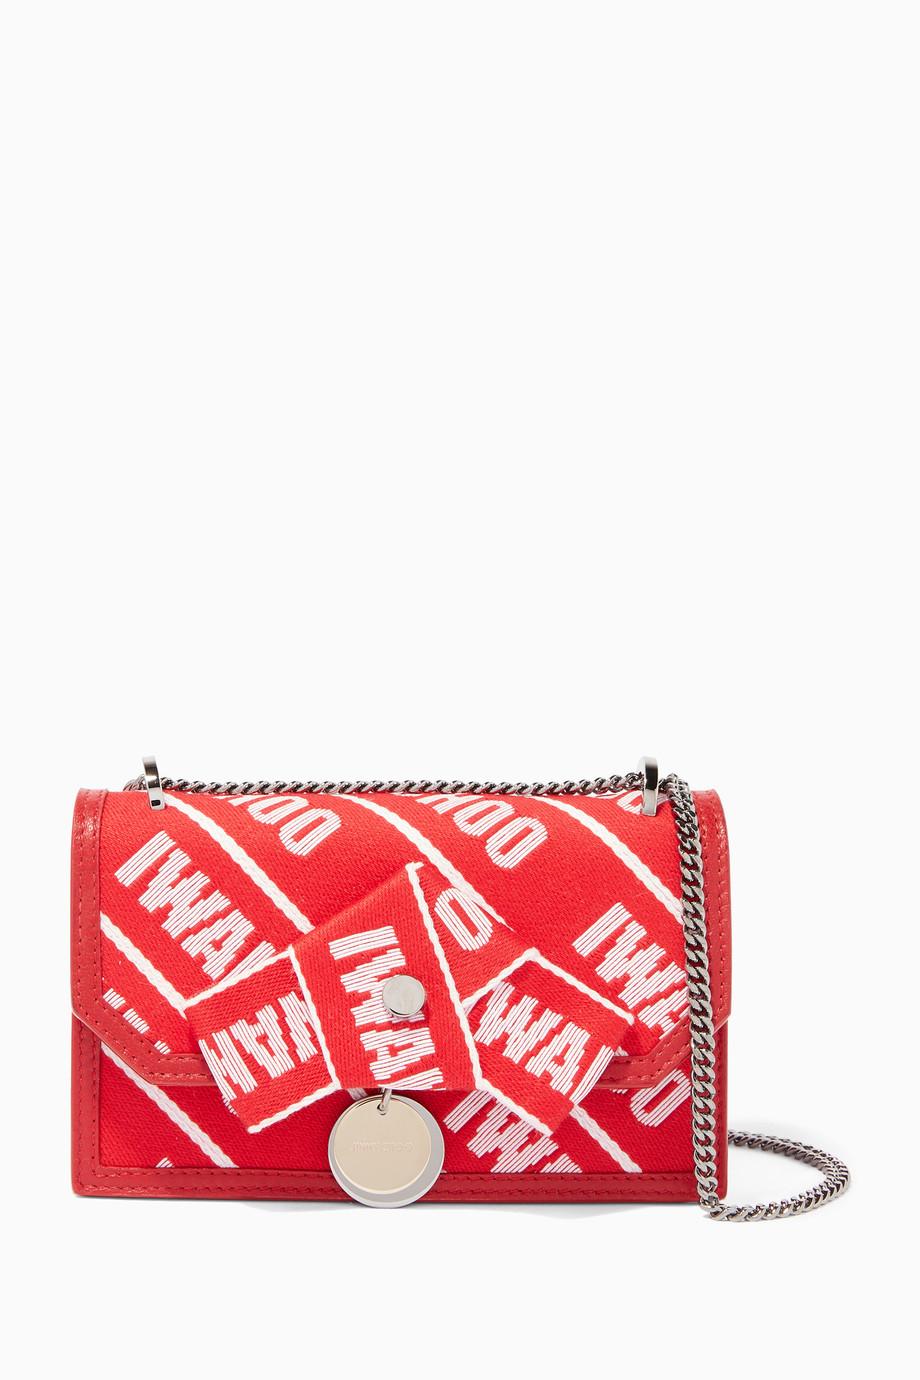 60b18d86577 Shop Jimmy Choo Pink Red   Rosewater Mini Finley Tape Shoulder Bag for  Women